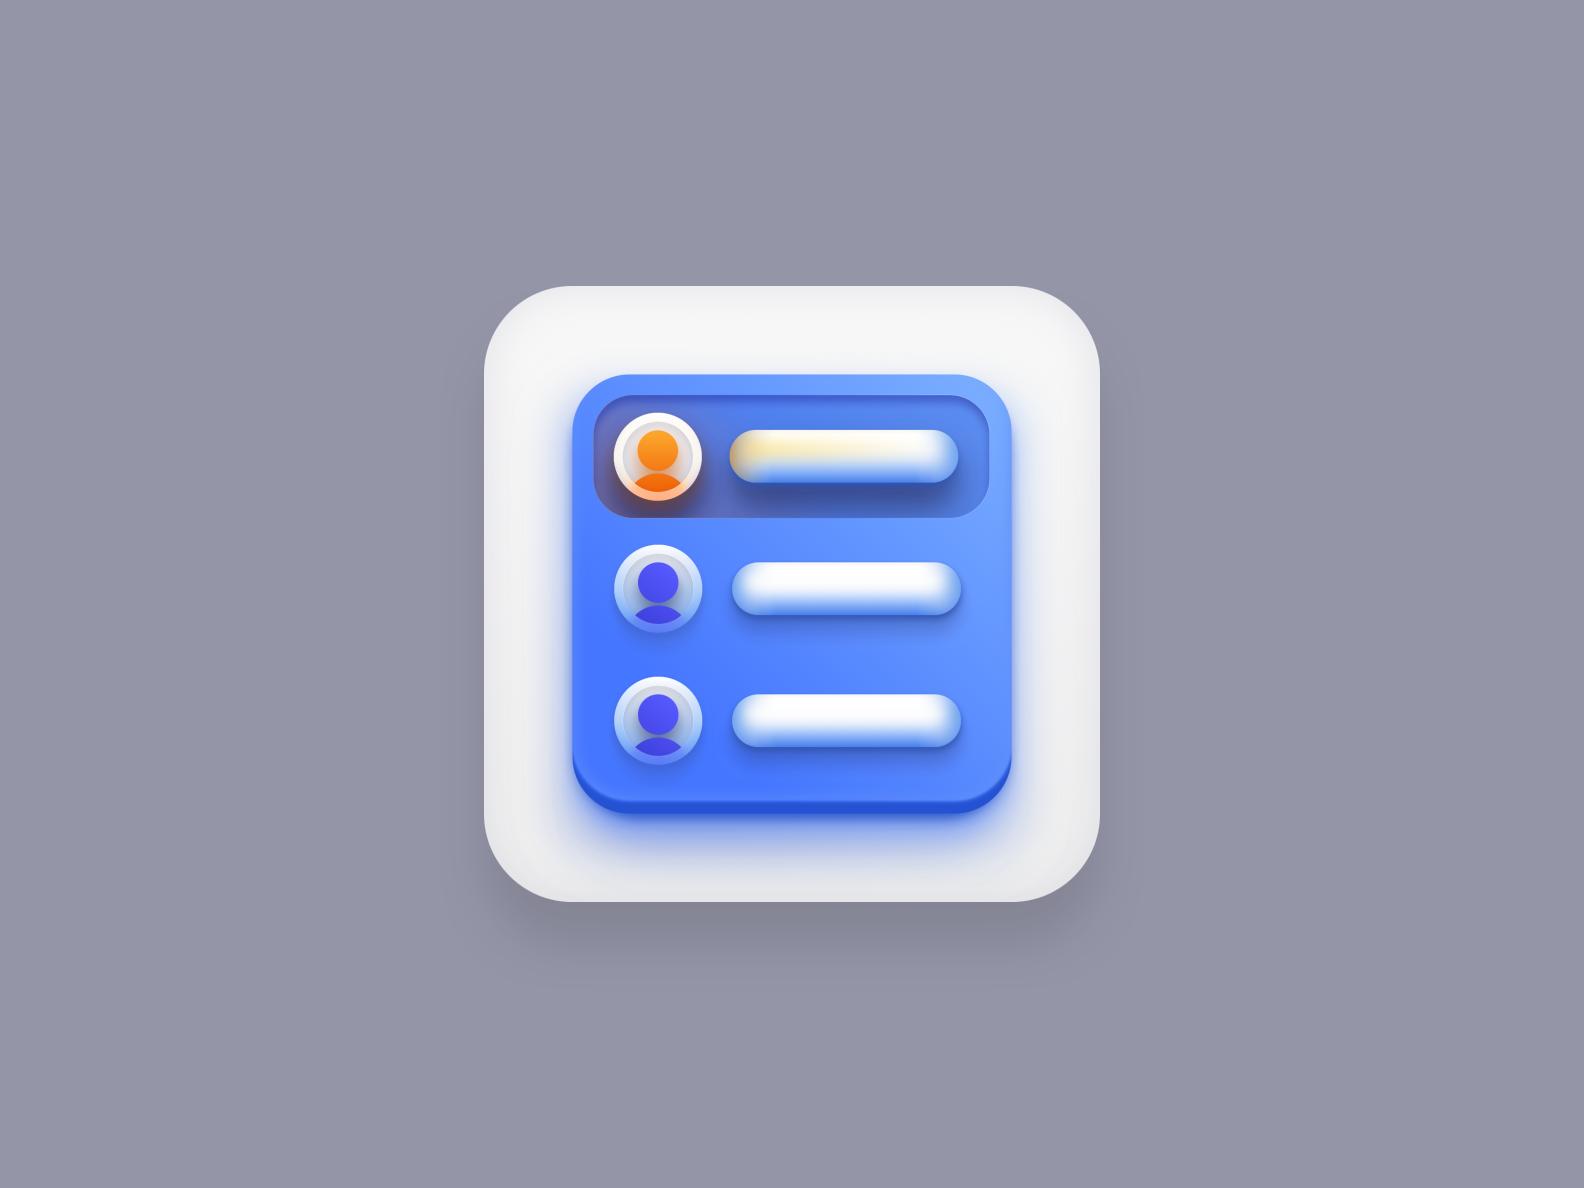 Contact Management (Big Sur icon style)